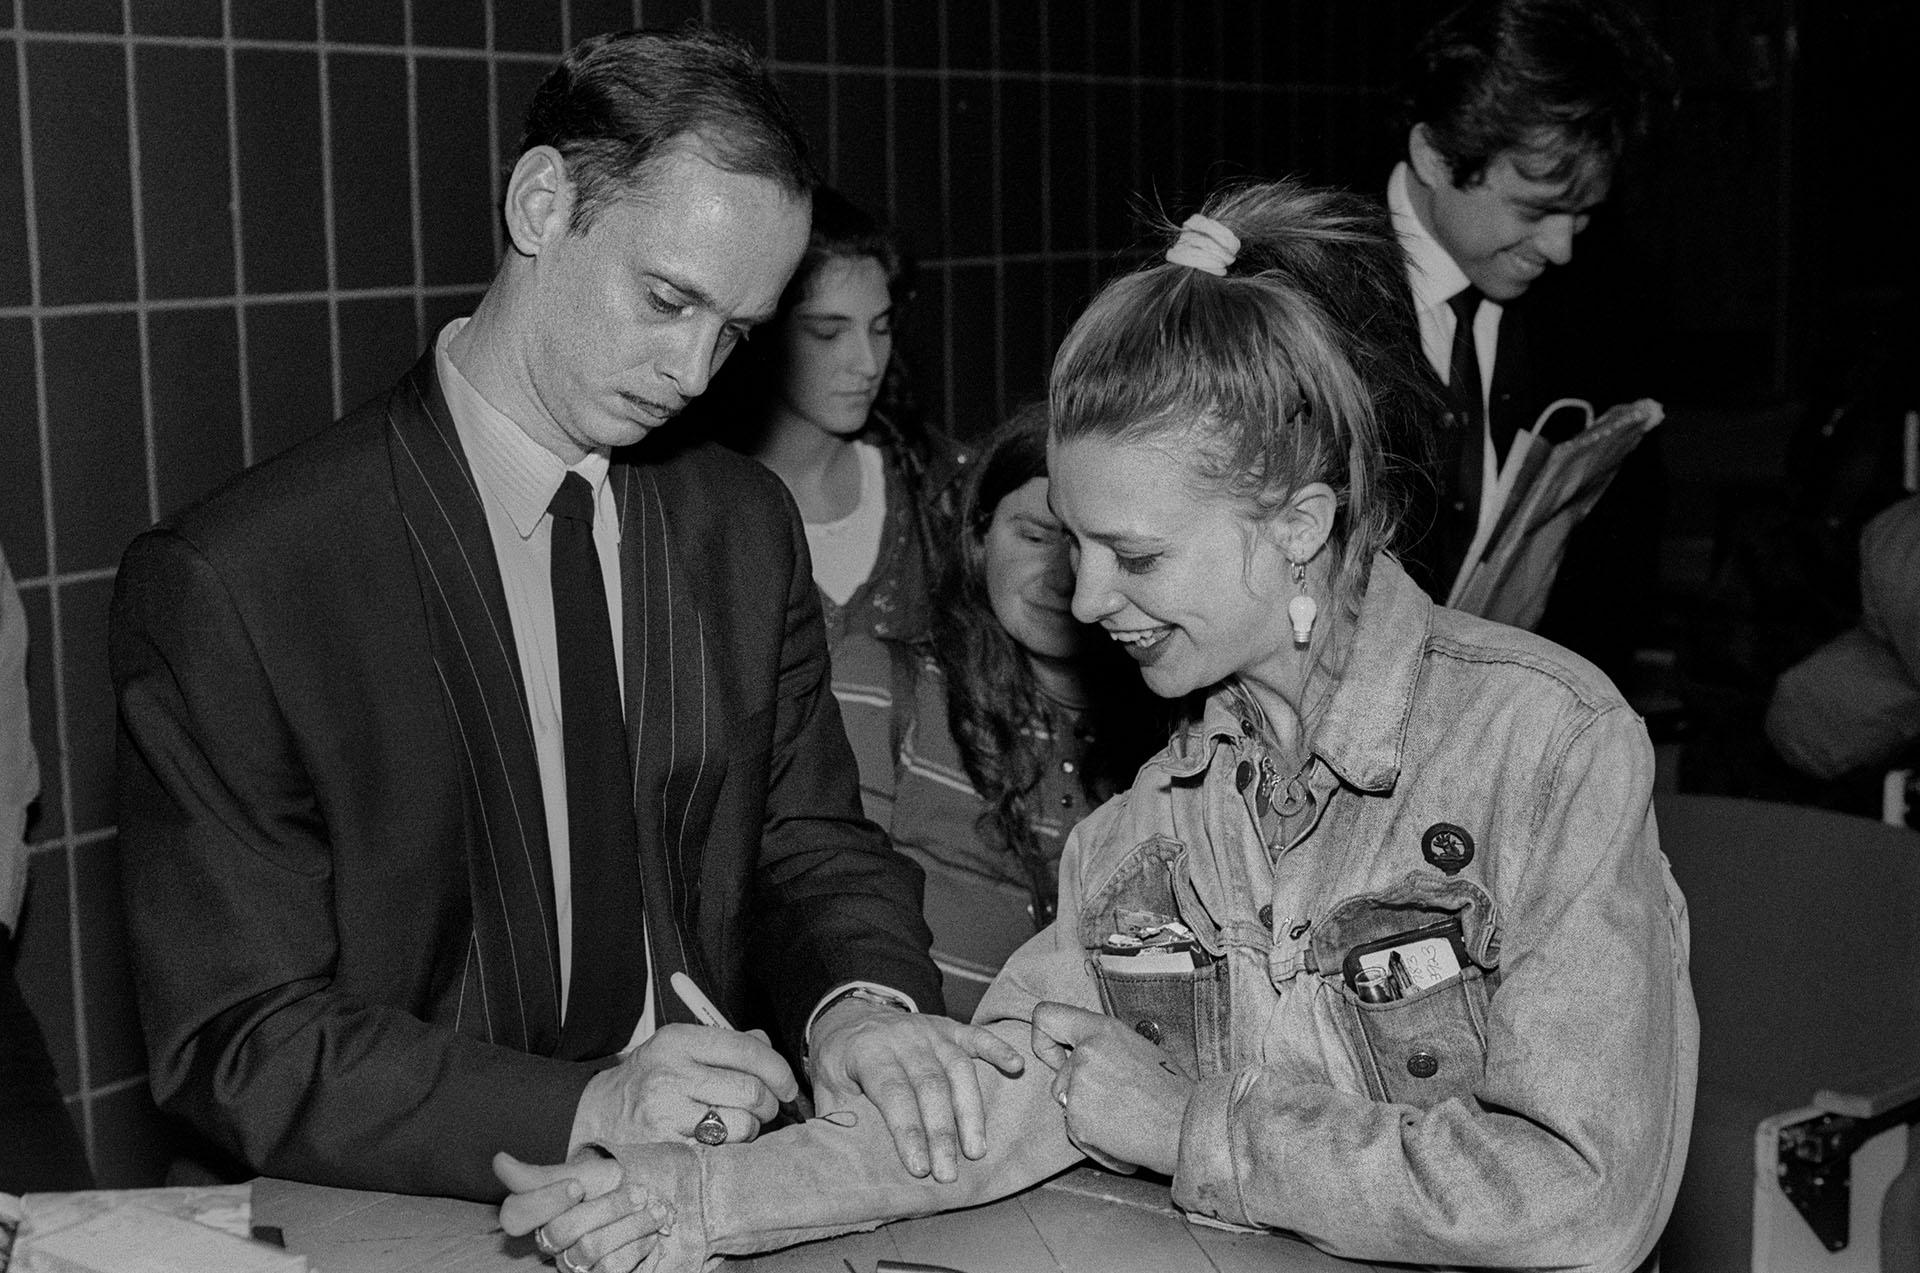 File:John Waters fan signature jpg - Wikimedia Commons